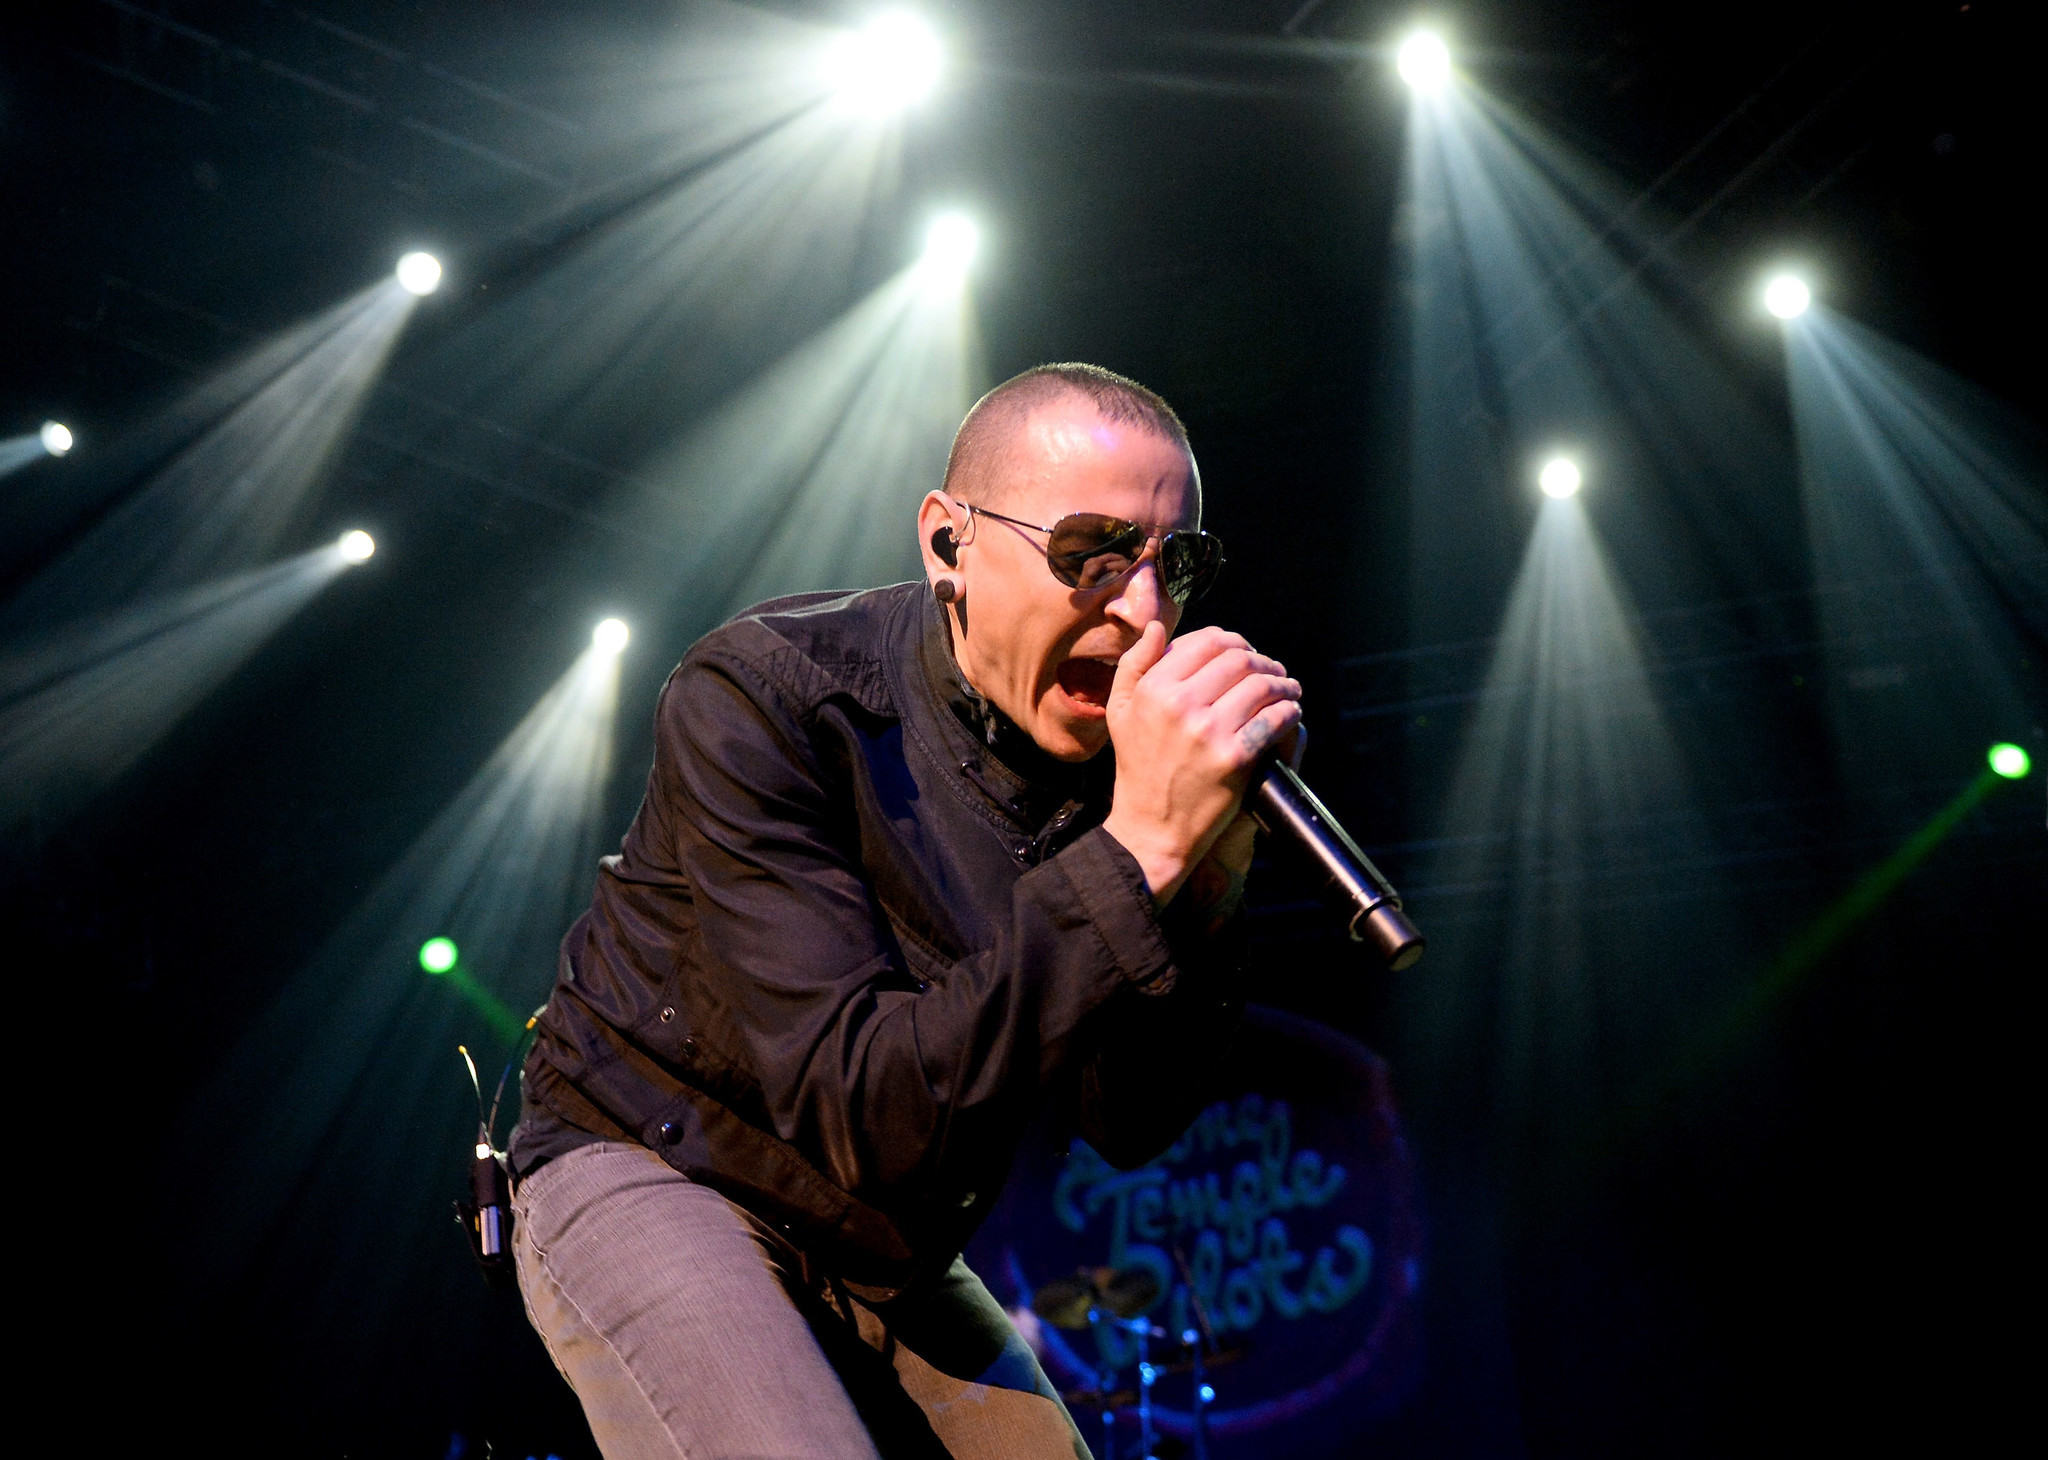 Linkin Park Frontman Chester Bennington Dies At 41